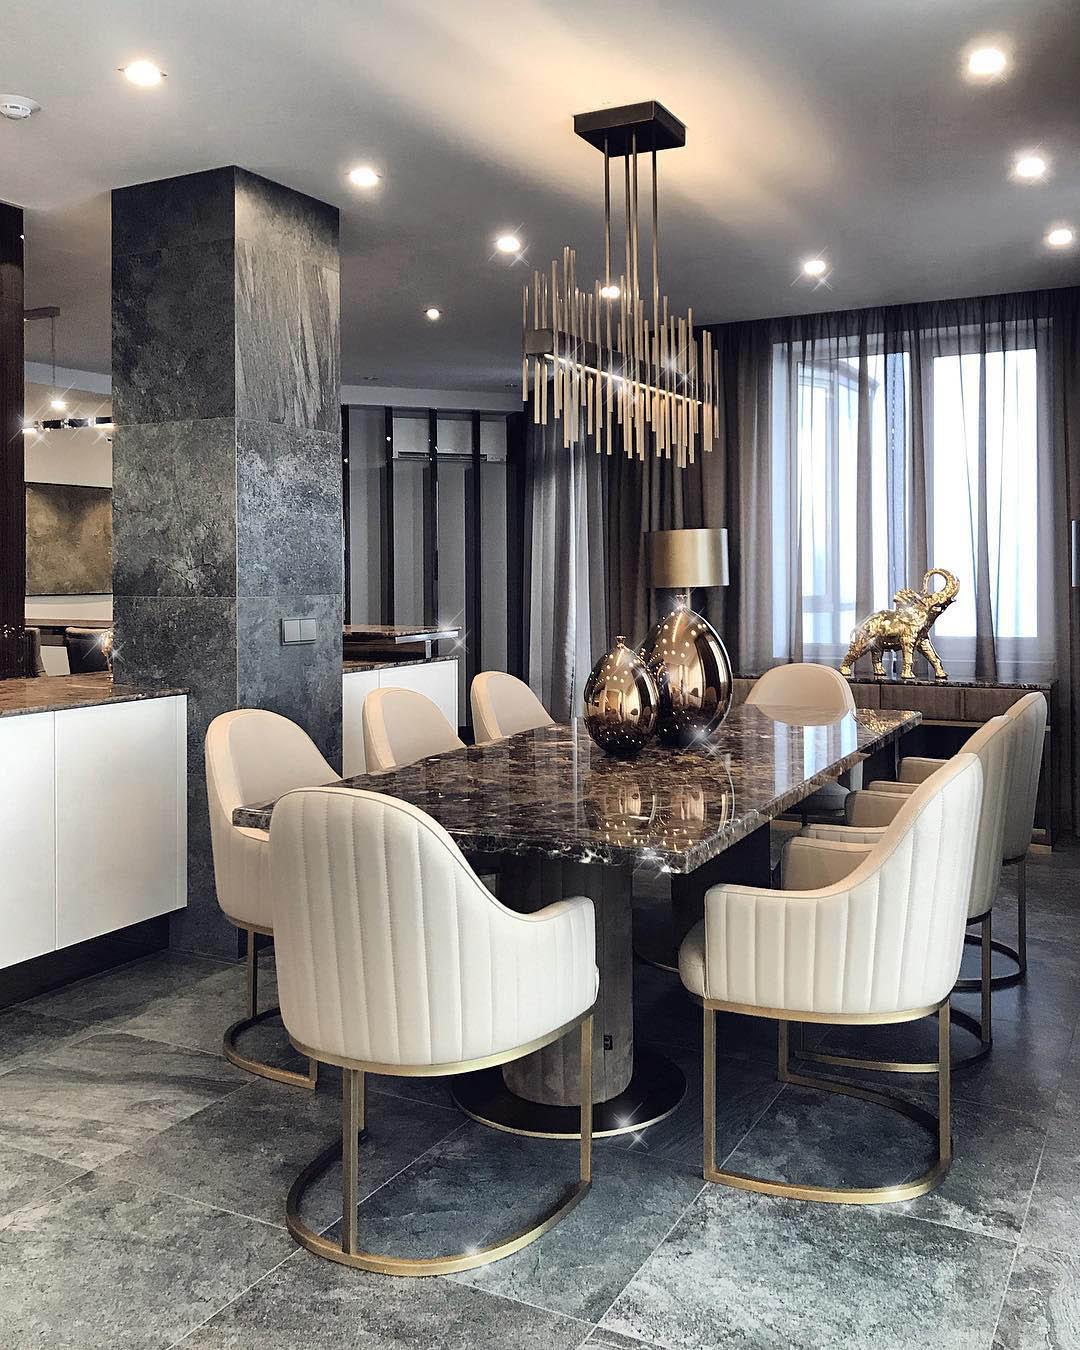 Constantin Frolov Interior Design | Luxury Dining Room